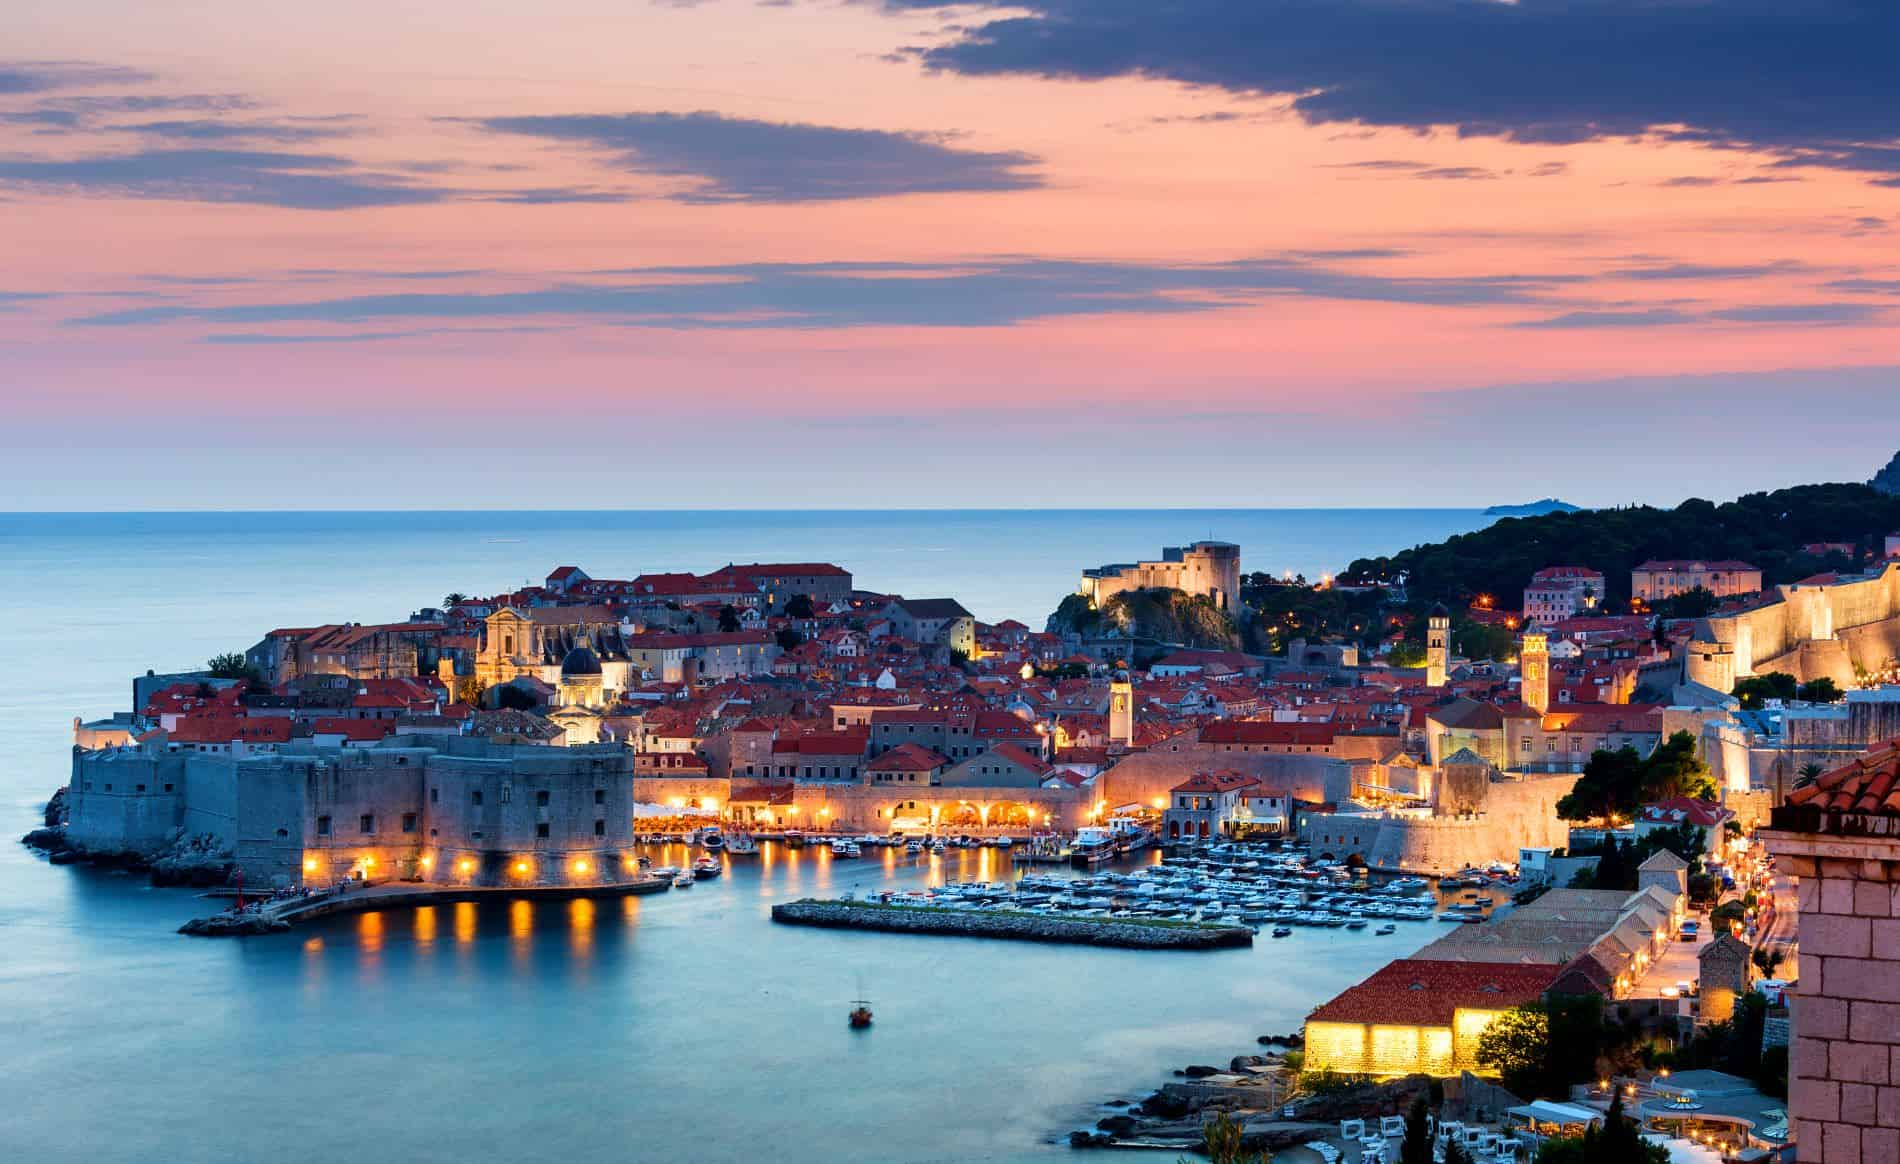 Yacht harbour, Dubrovnik